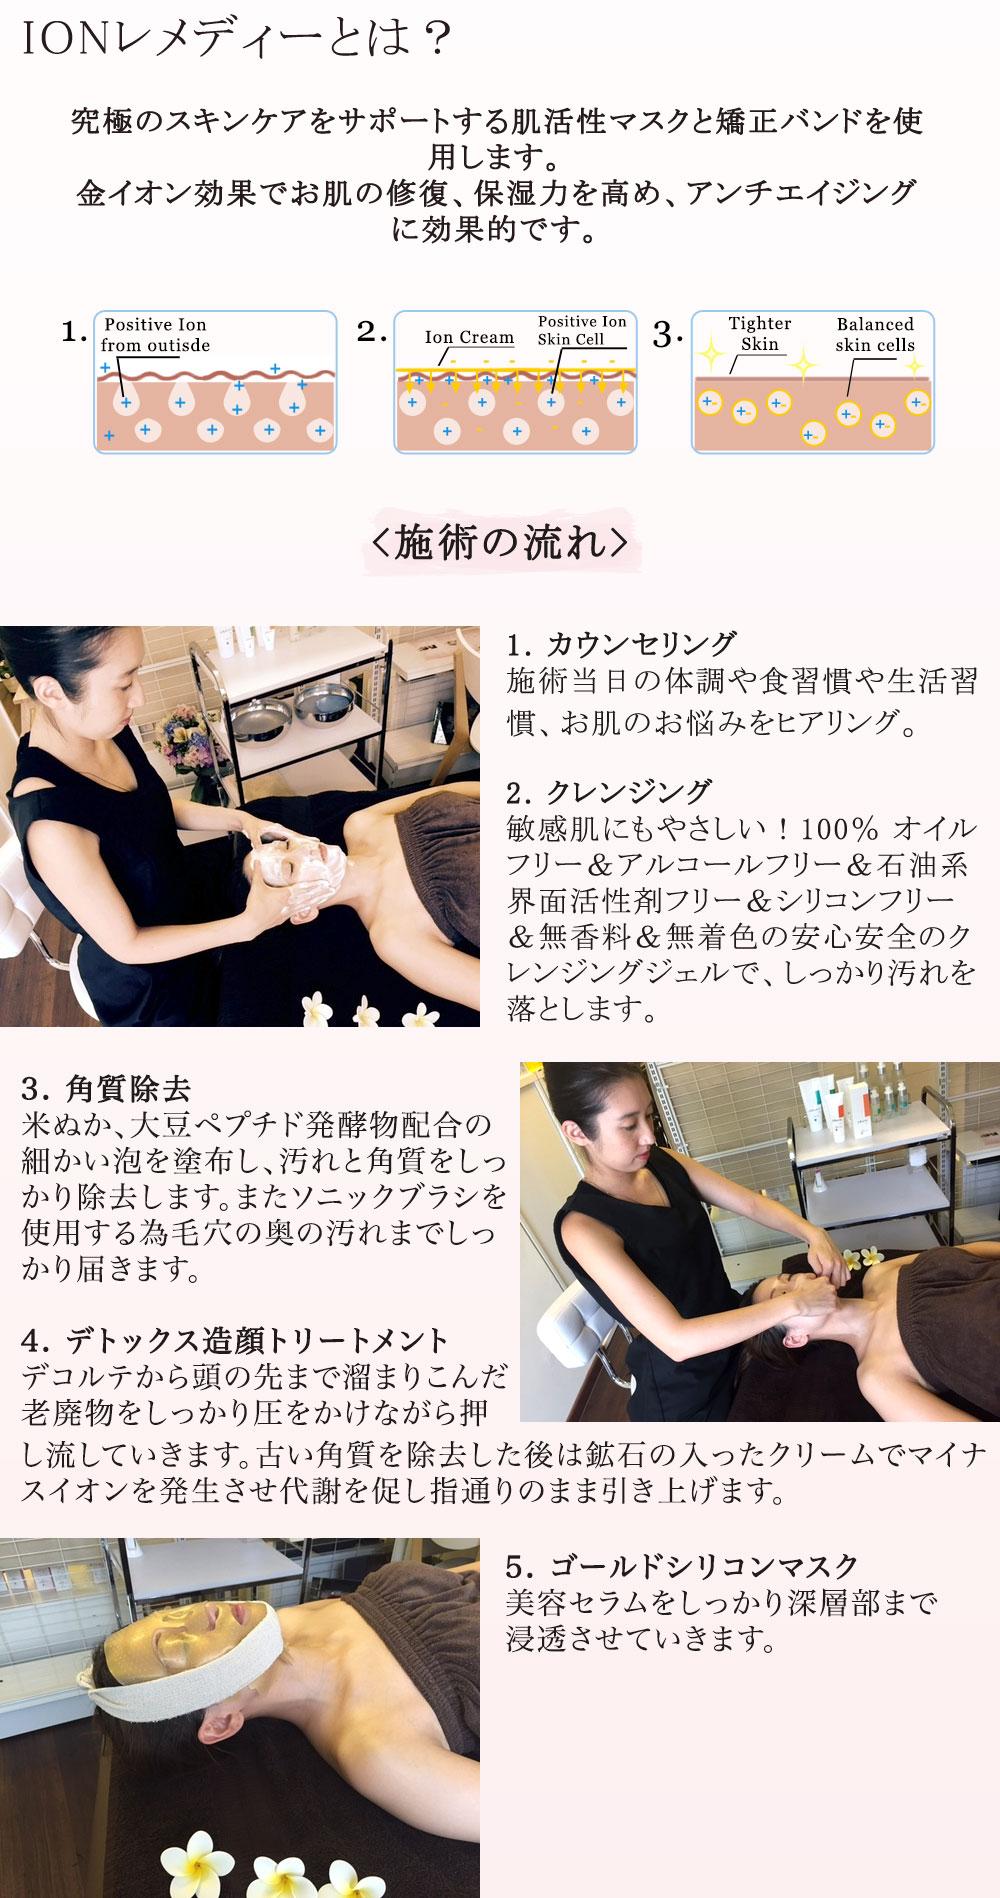 jap_lympathic_massage_ION.jpg